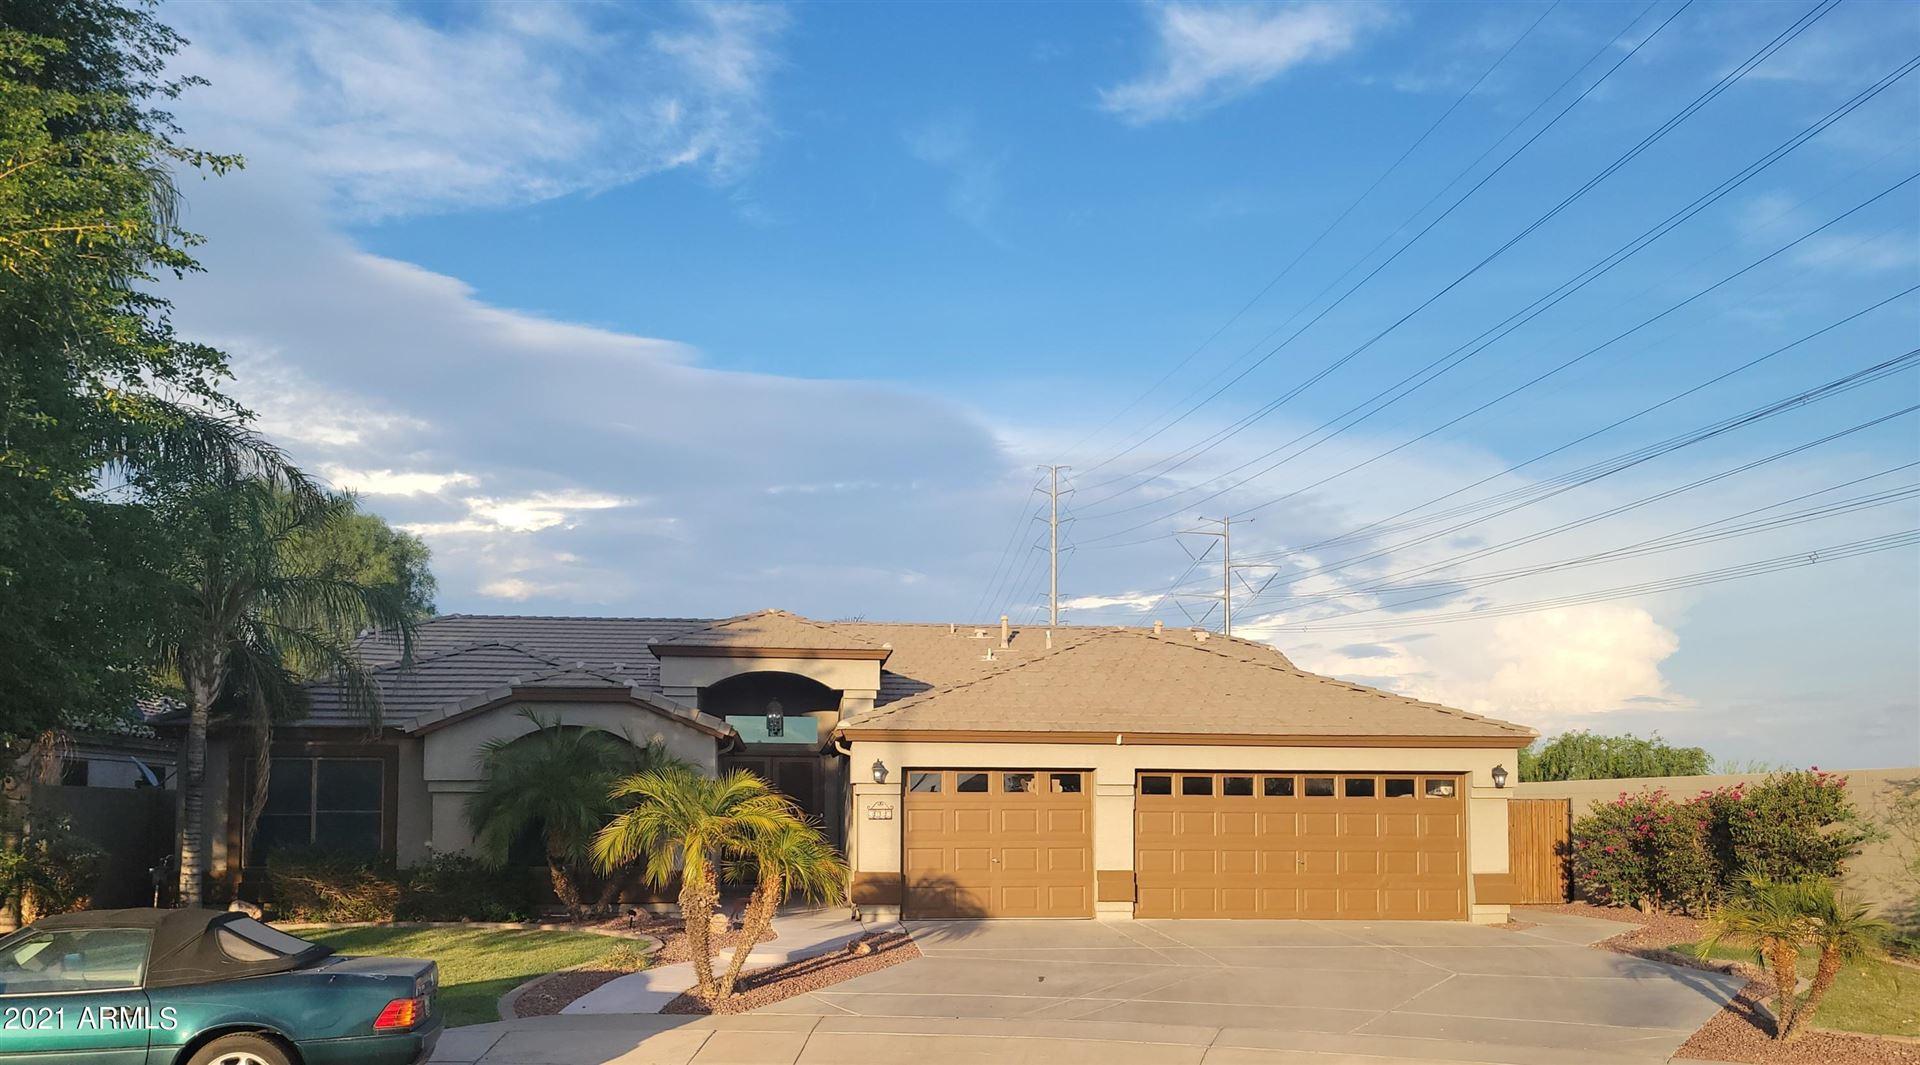 3135 S PATRICIO Circle, Mesa, AZ 85212 - MLS#: 6260854